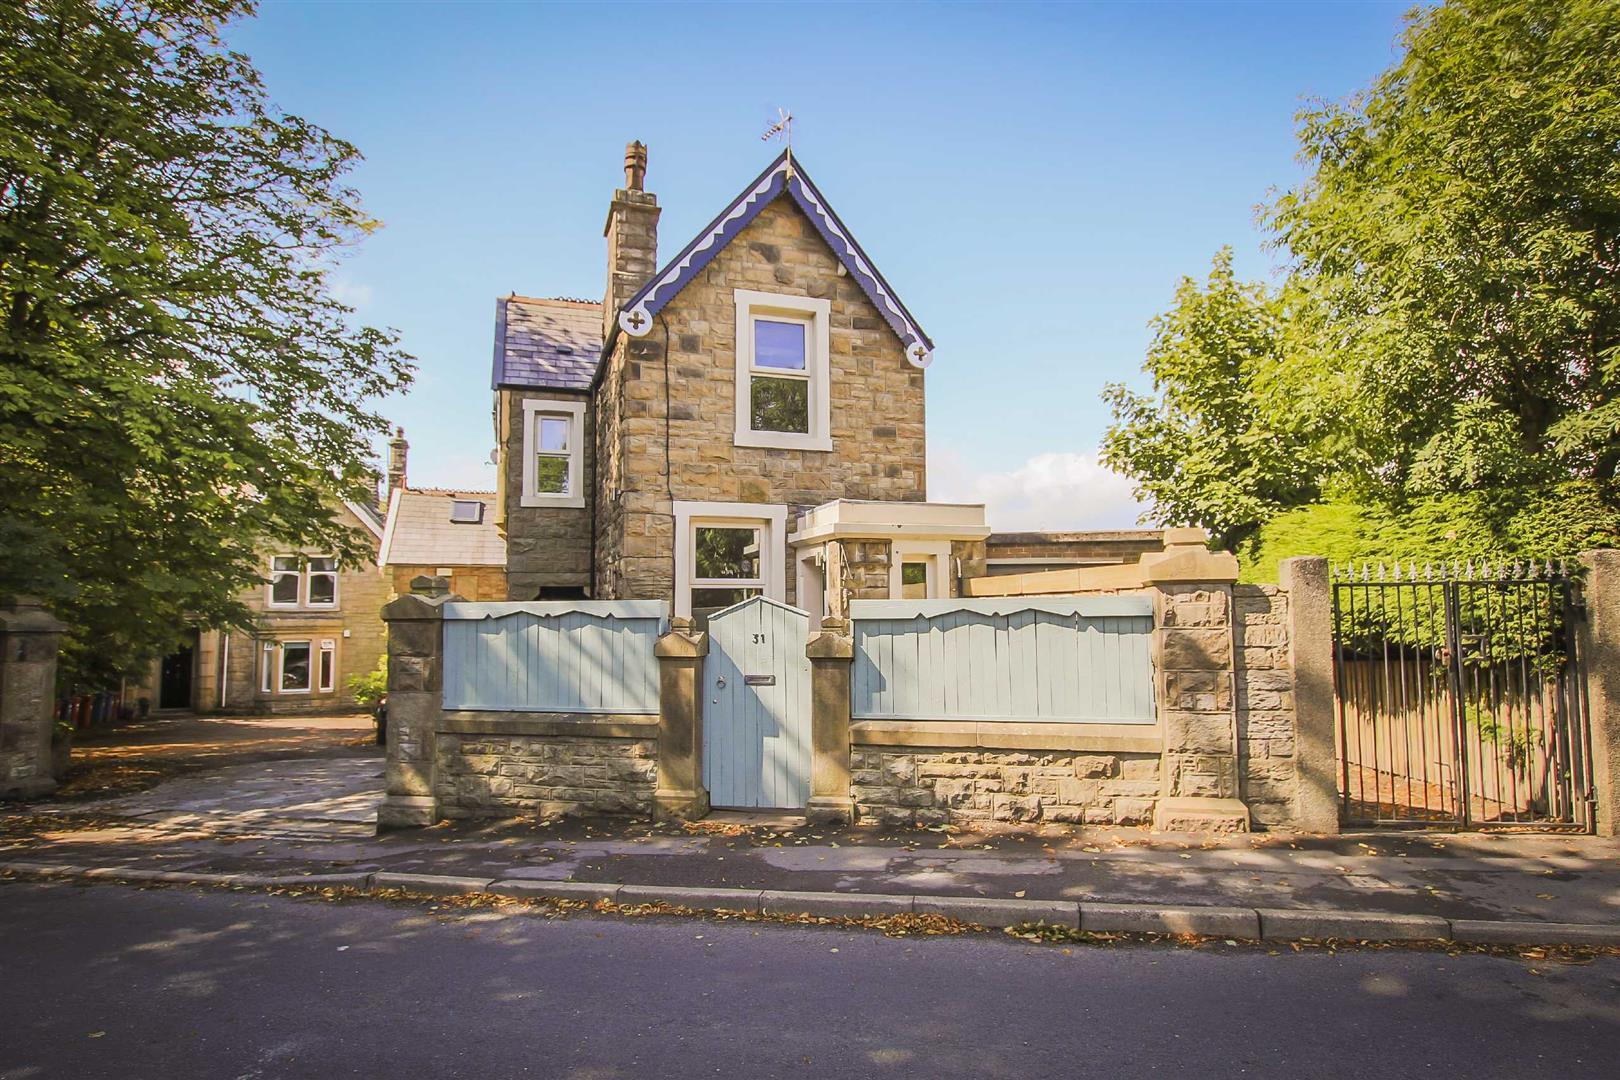 2 Bedroom Detached House For Sale - Image 4